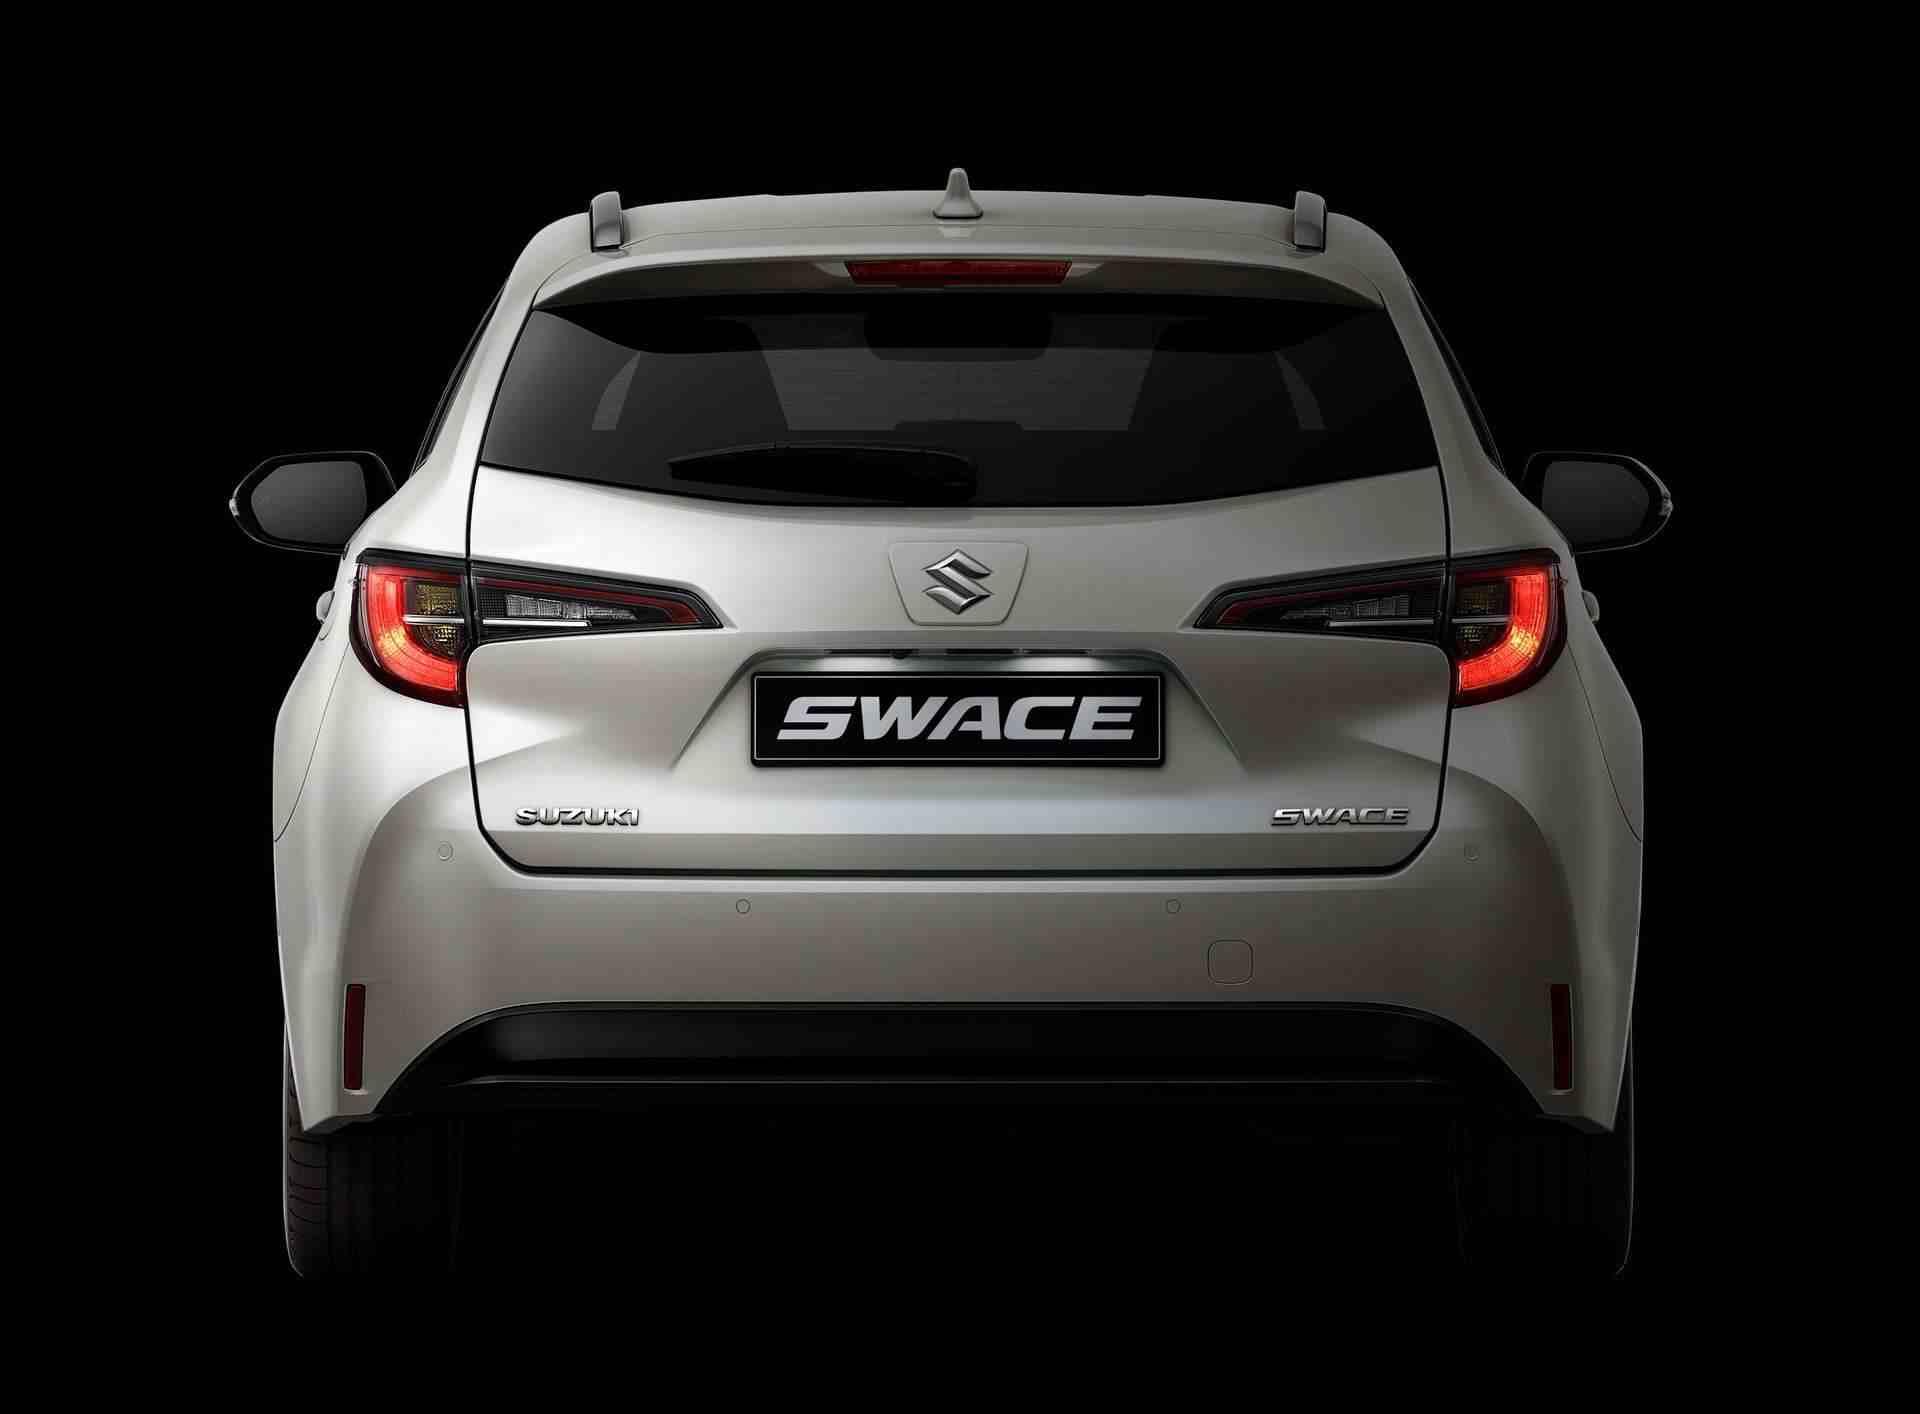 Suzuki_Swace_Greek-0007